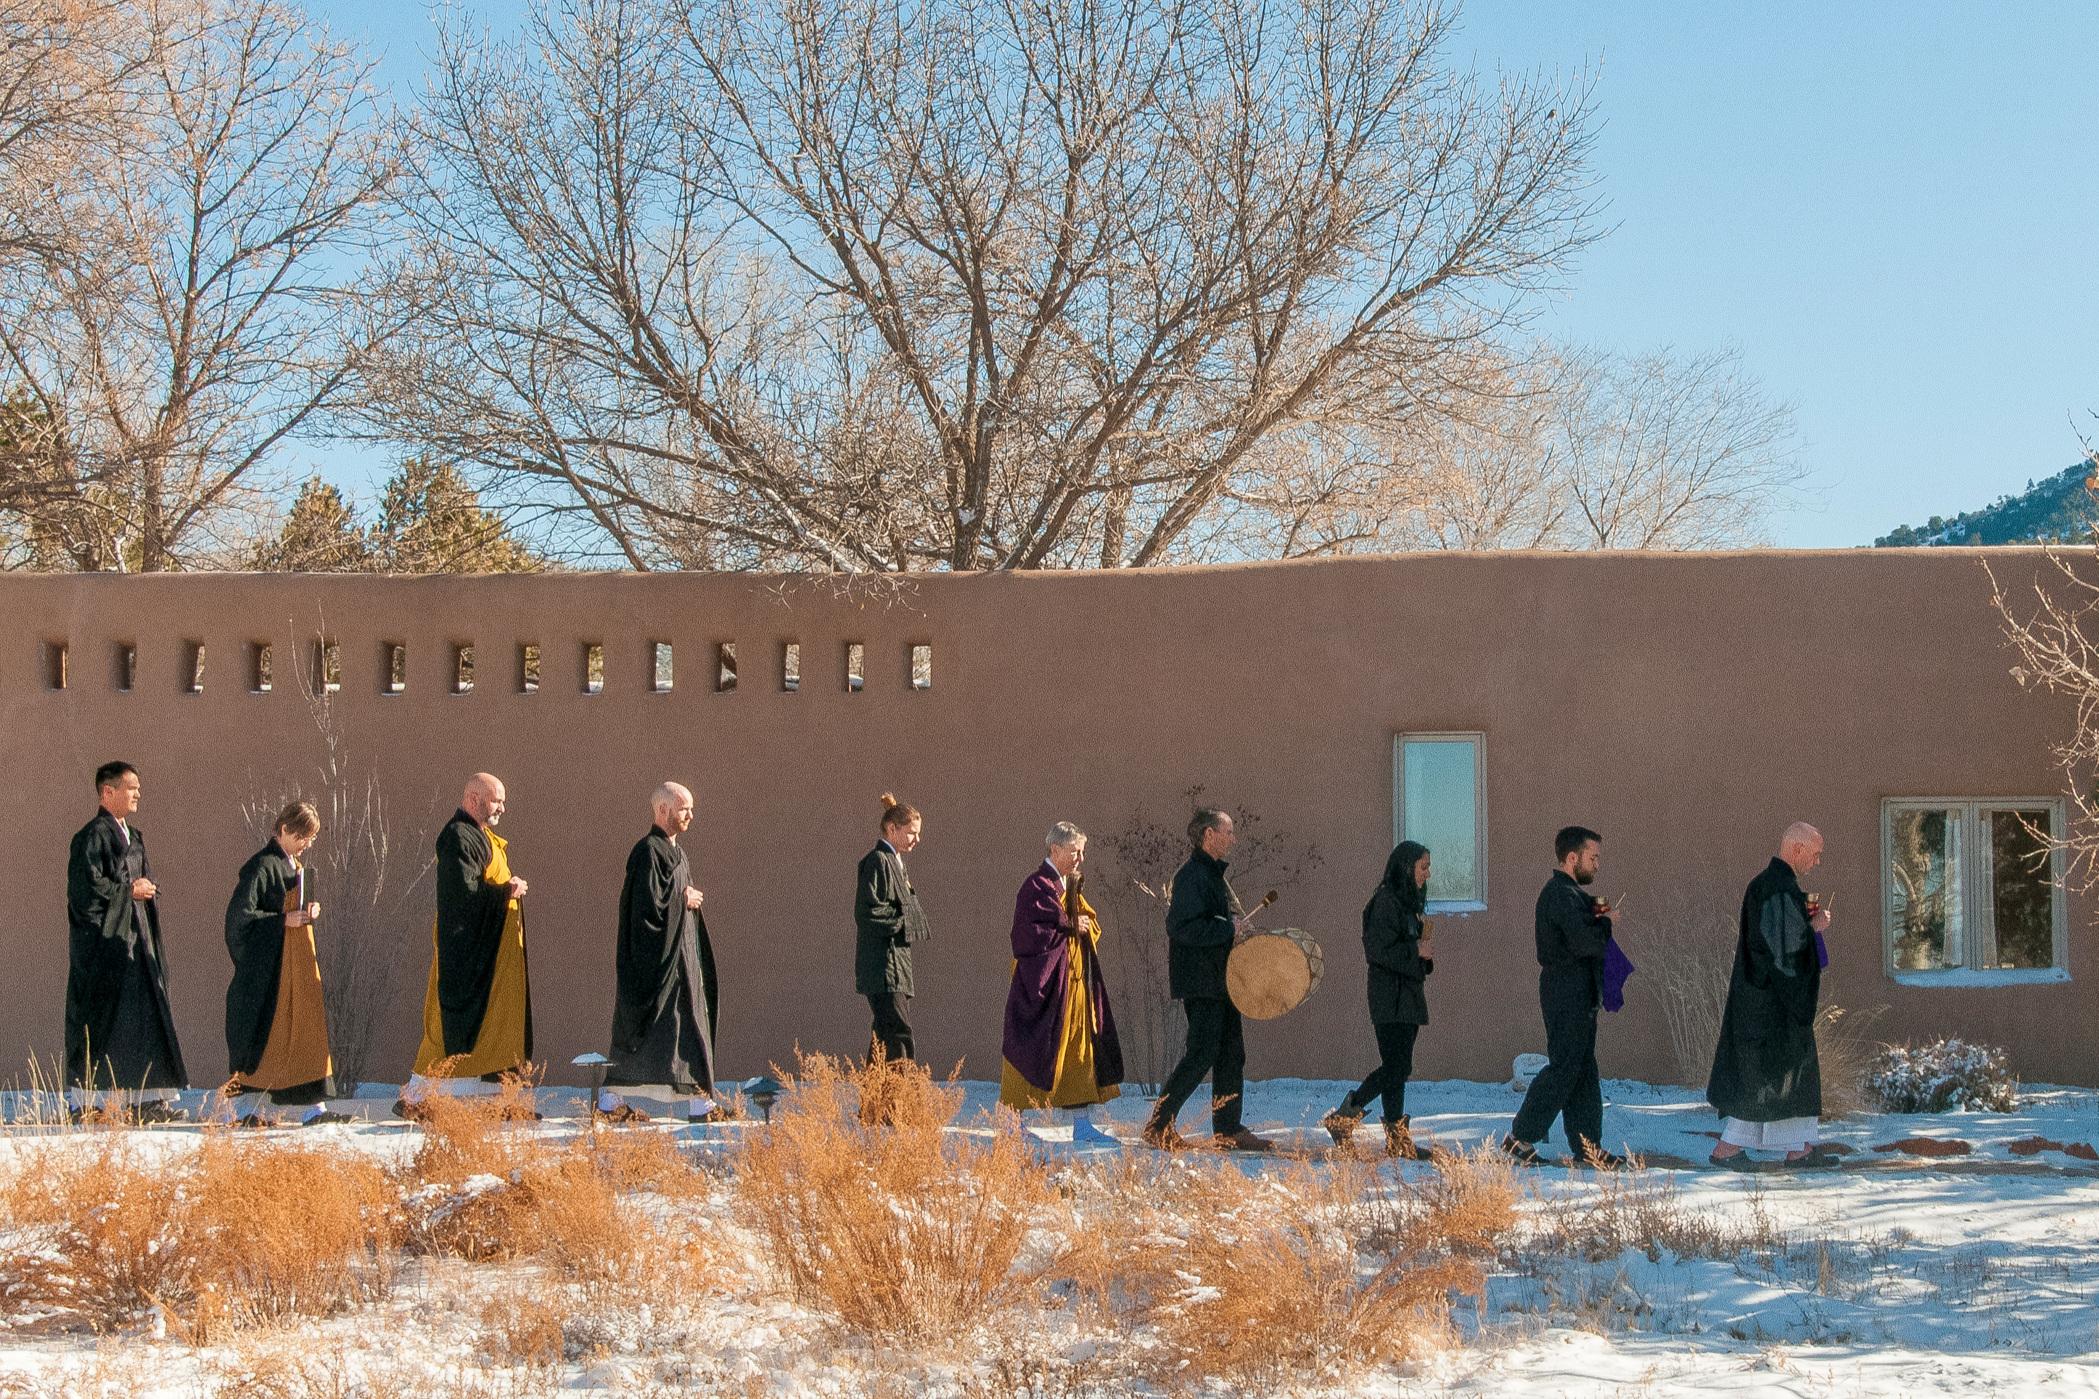 New MexicO:UPAYA - Upaya Zen Center in Santa Fe, New Mexico offers daily Zen meditation, weekly dharma talks, and programs on Buddhist teachings, art, neuroscience, and social engagement.Upaya Institut website